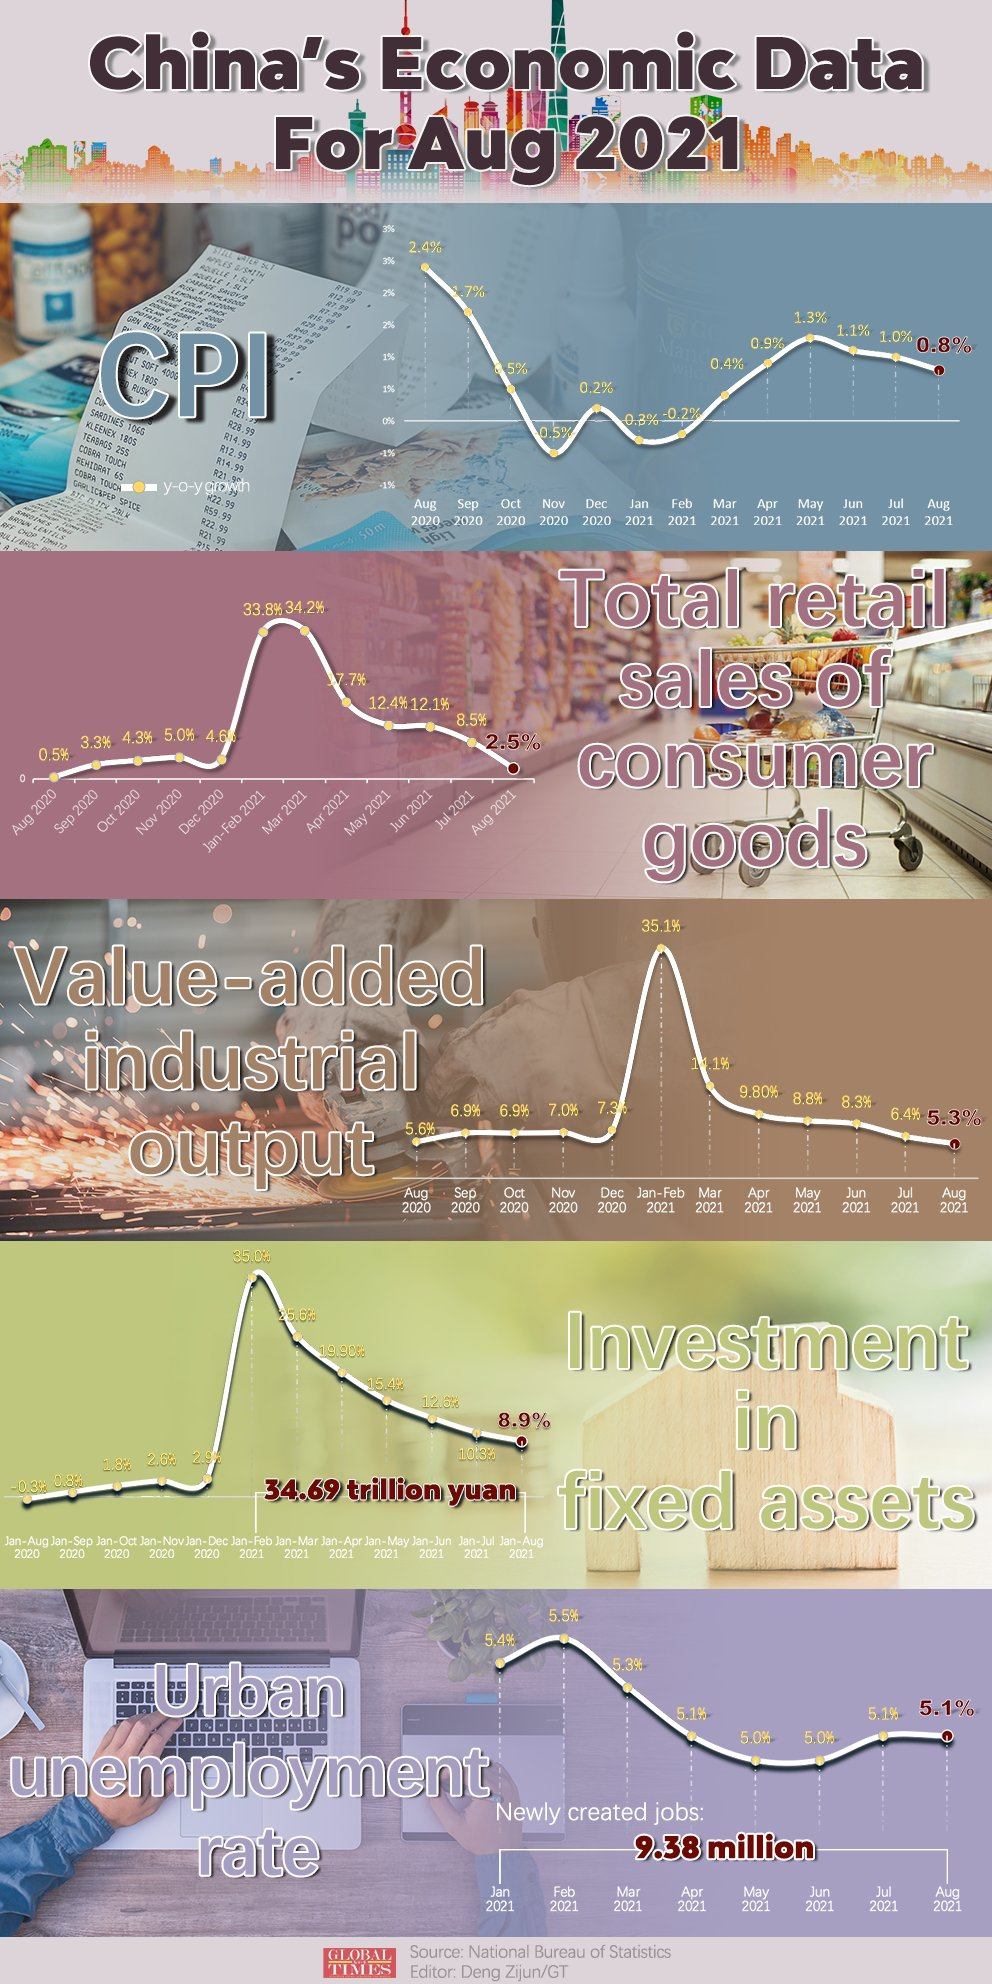 China's economic data for Aug 2021 Infographic: Deng Zijun/GT